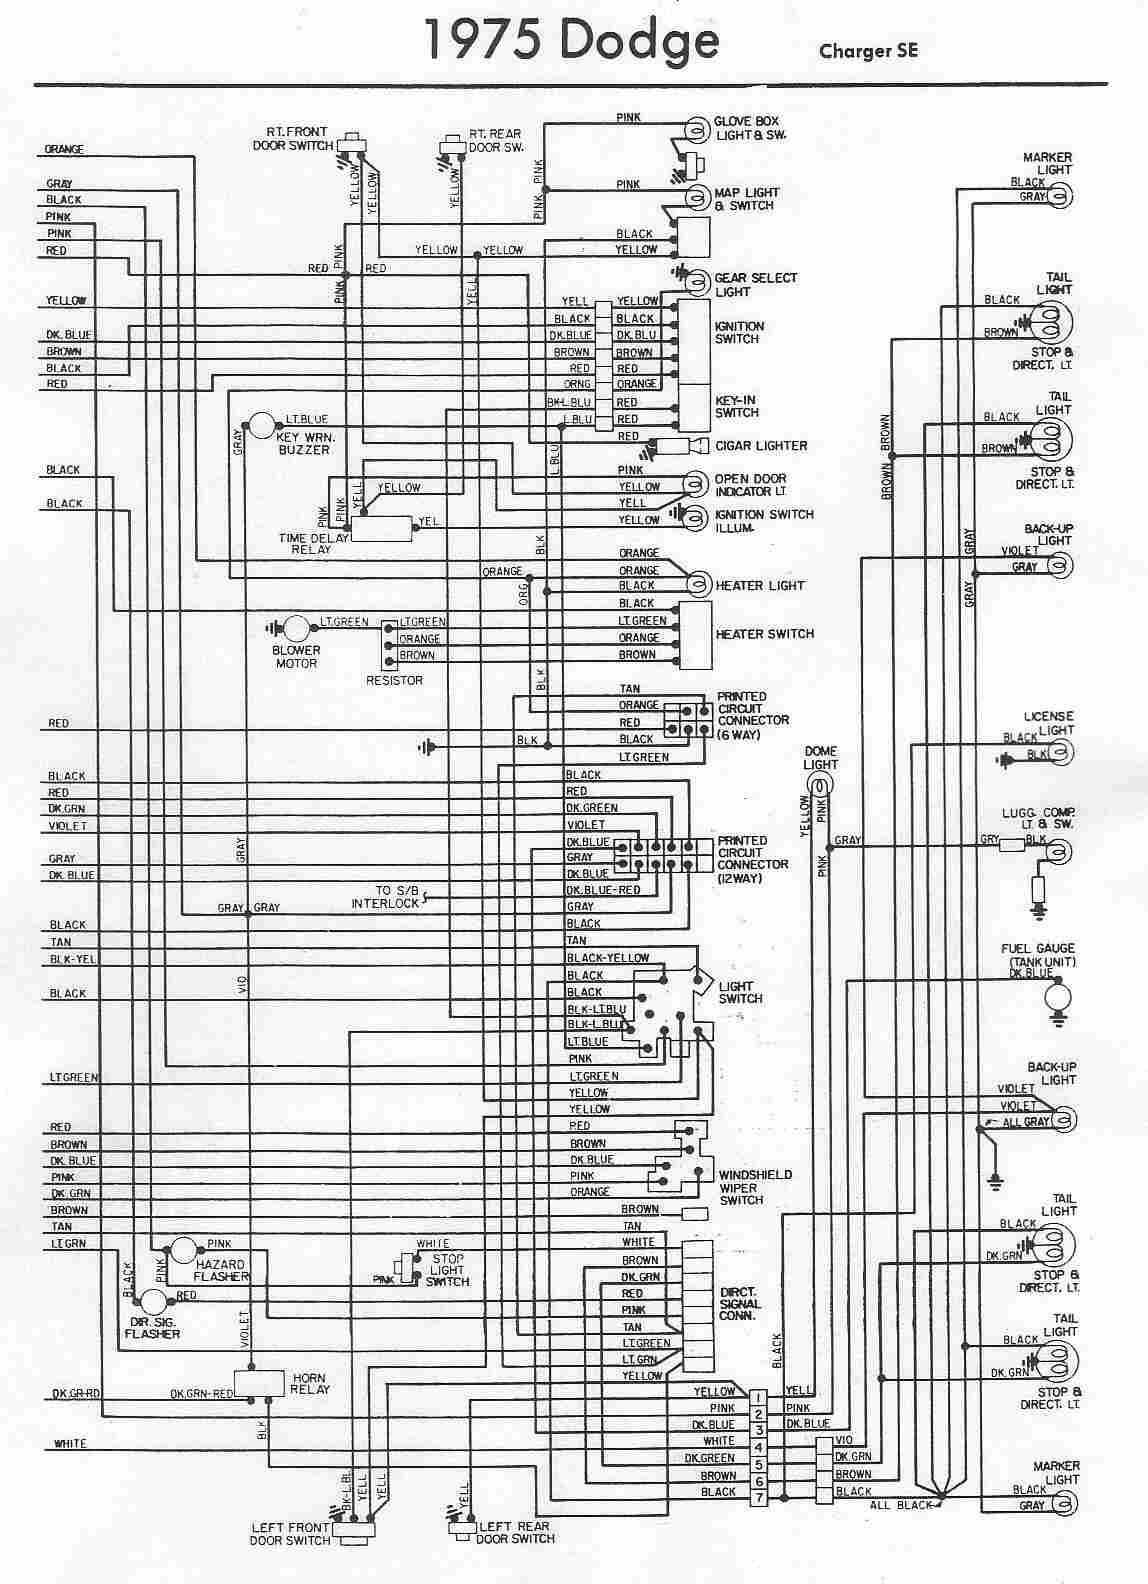 wiring diagram 1974 dodge 100 wiring diagram technic [ 1148 x 1584 Pixel ]